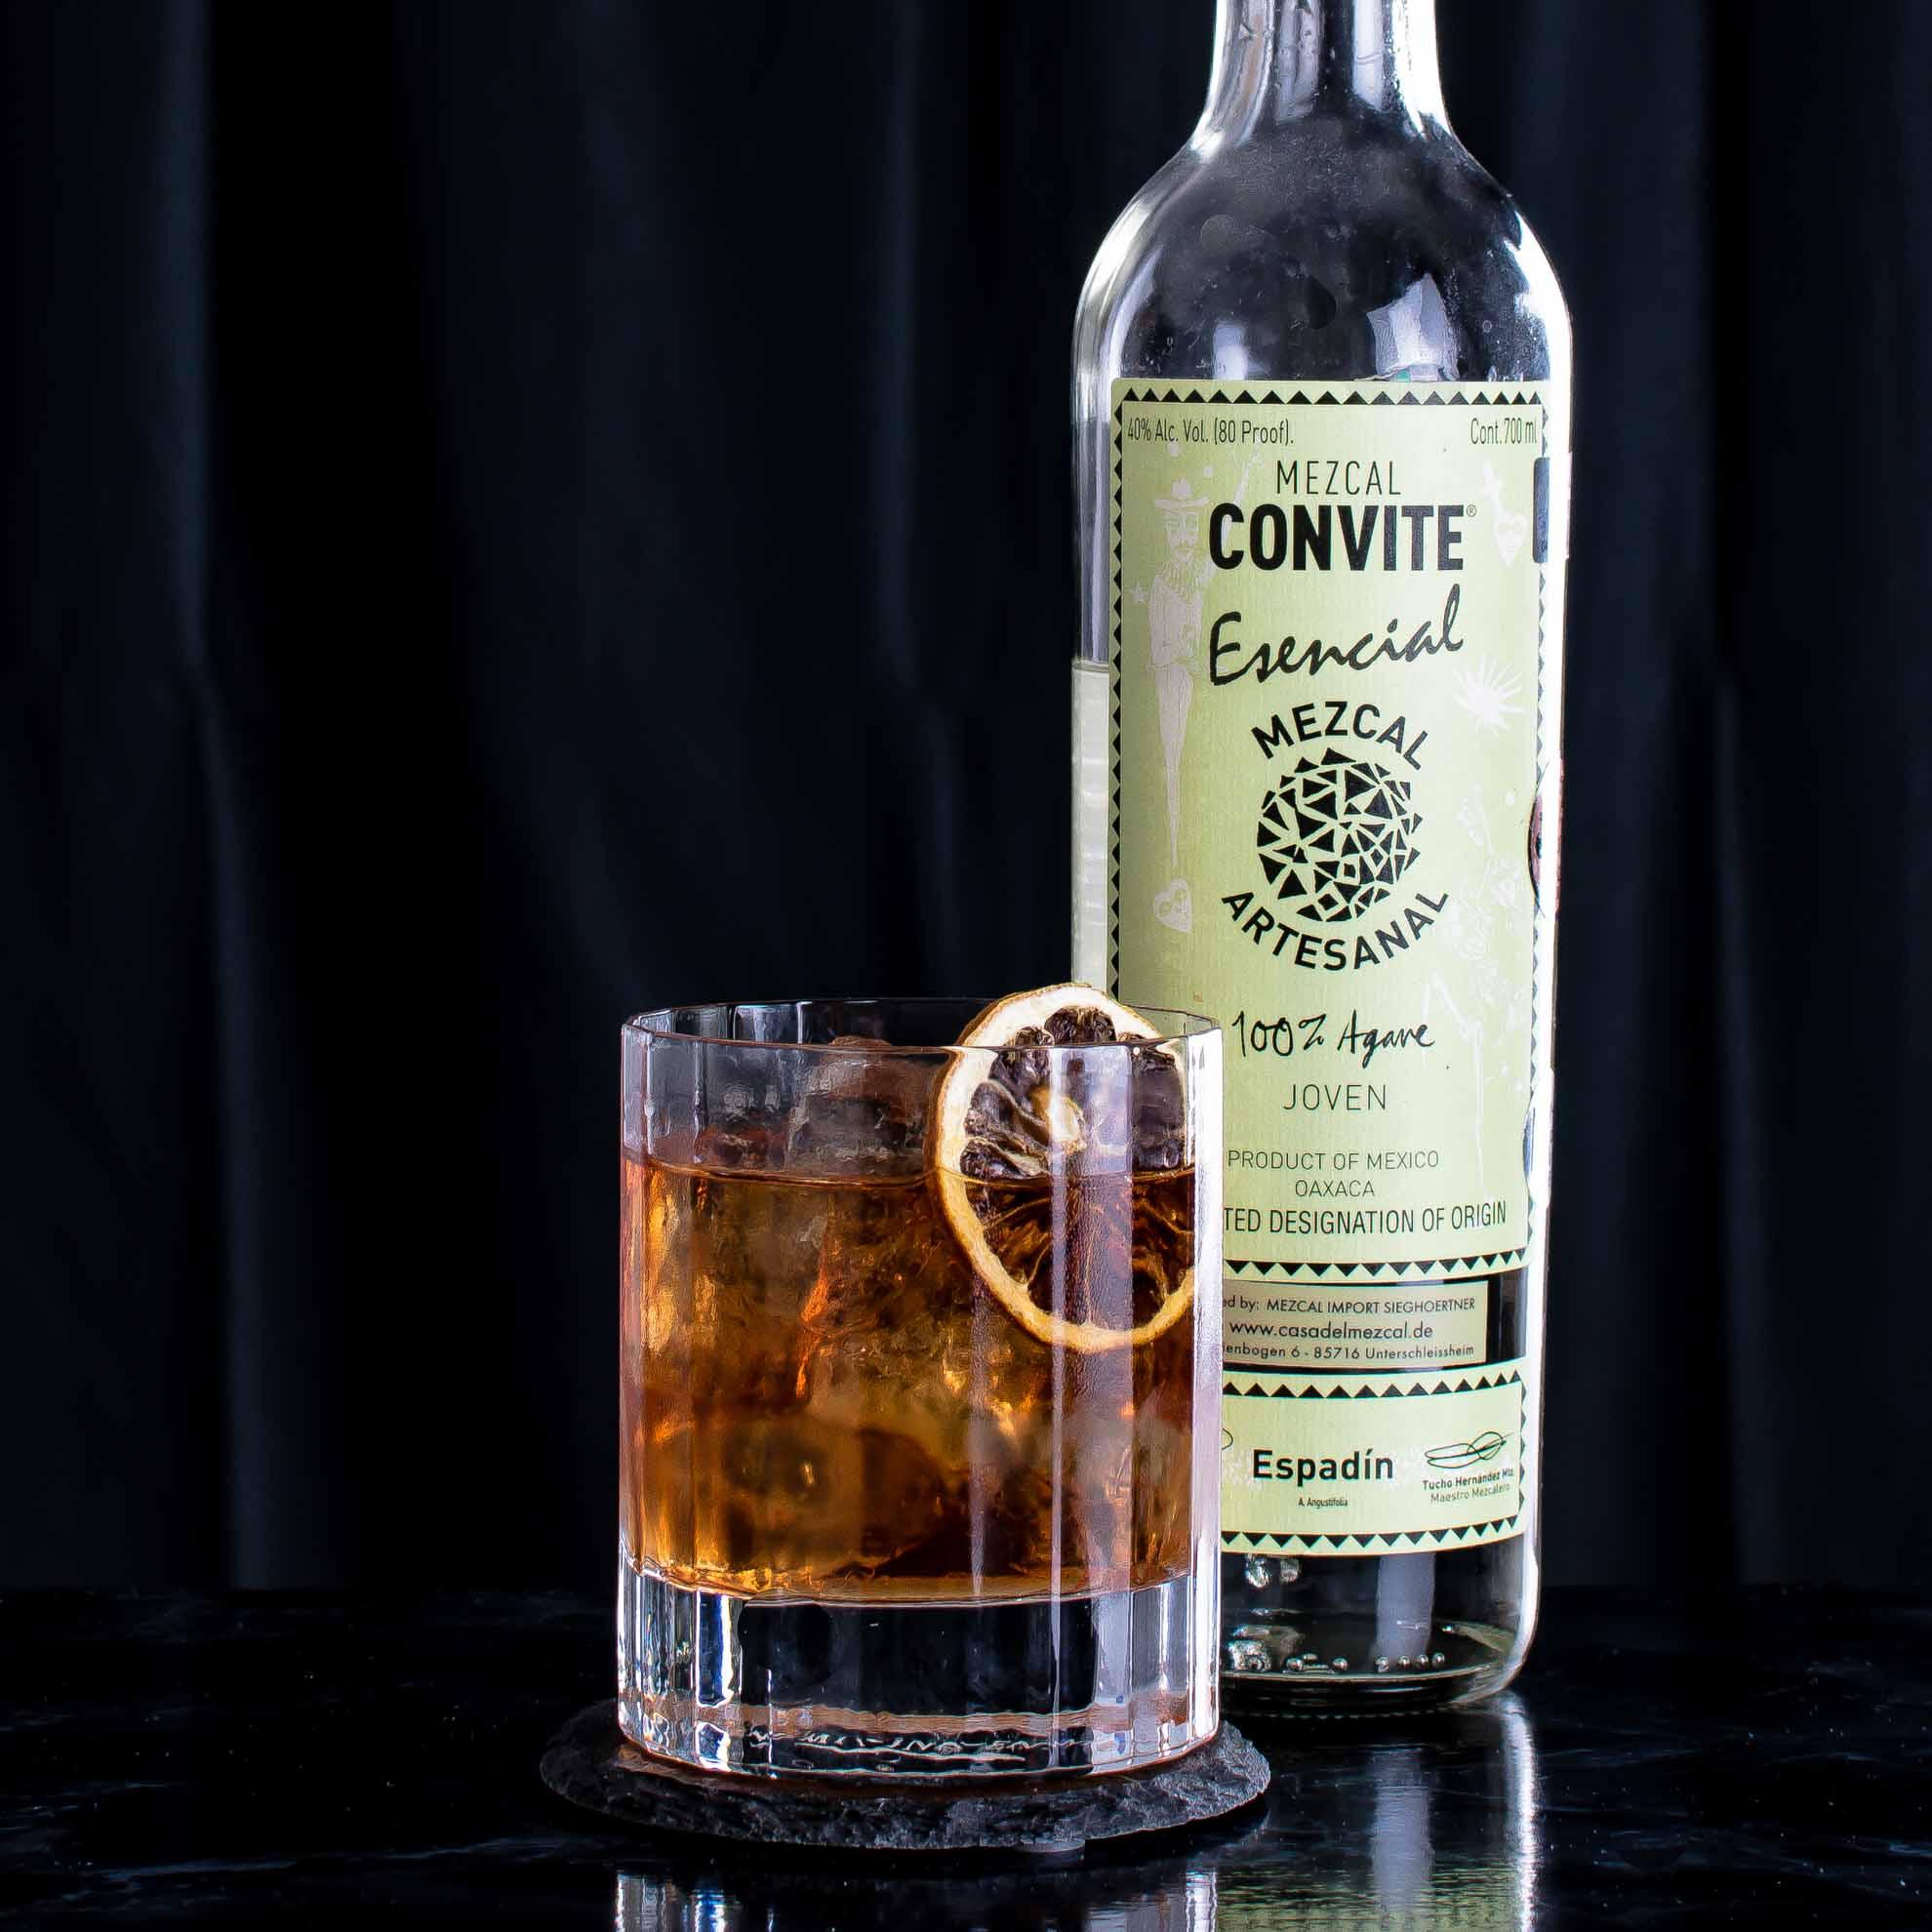 Convite Esencial Mezcal im Split Base Old Fashioned mit Rum.